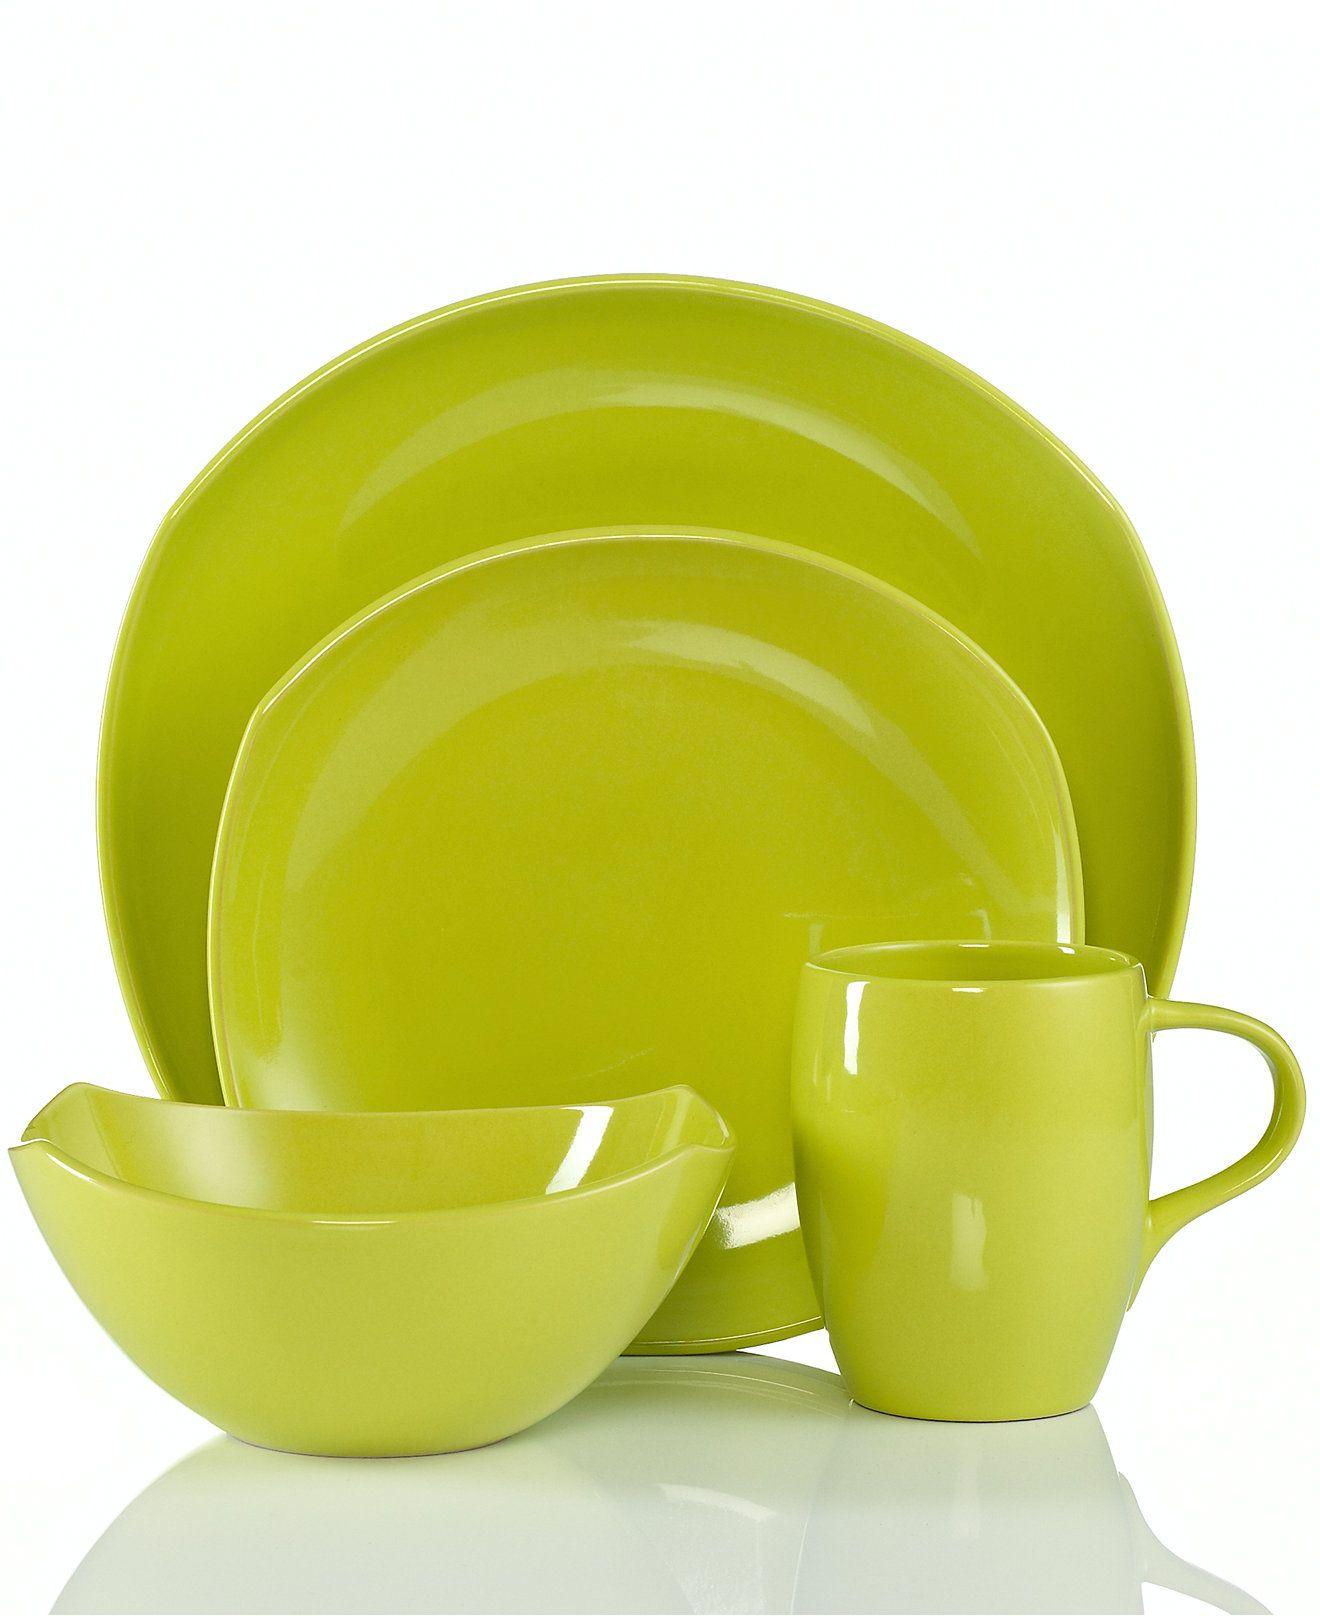 CLOSEOUT! Dansk Dinnerware Classic Fjord Apple Green Collection - Dinnerware - Dining \u0026 Entertaining  sc 1 st  Pinterest & CLOSEOUT! Dansk Dinnerware Classic Fjord Apple Green Collection ...